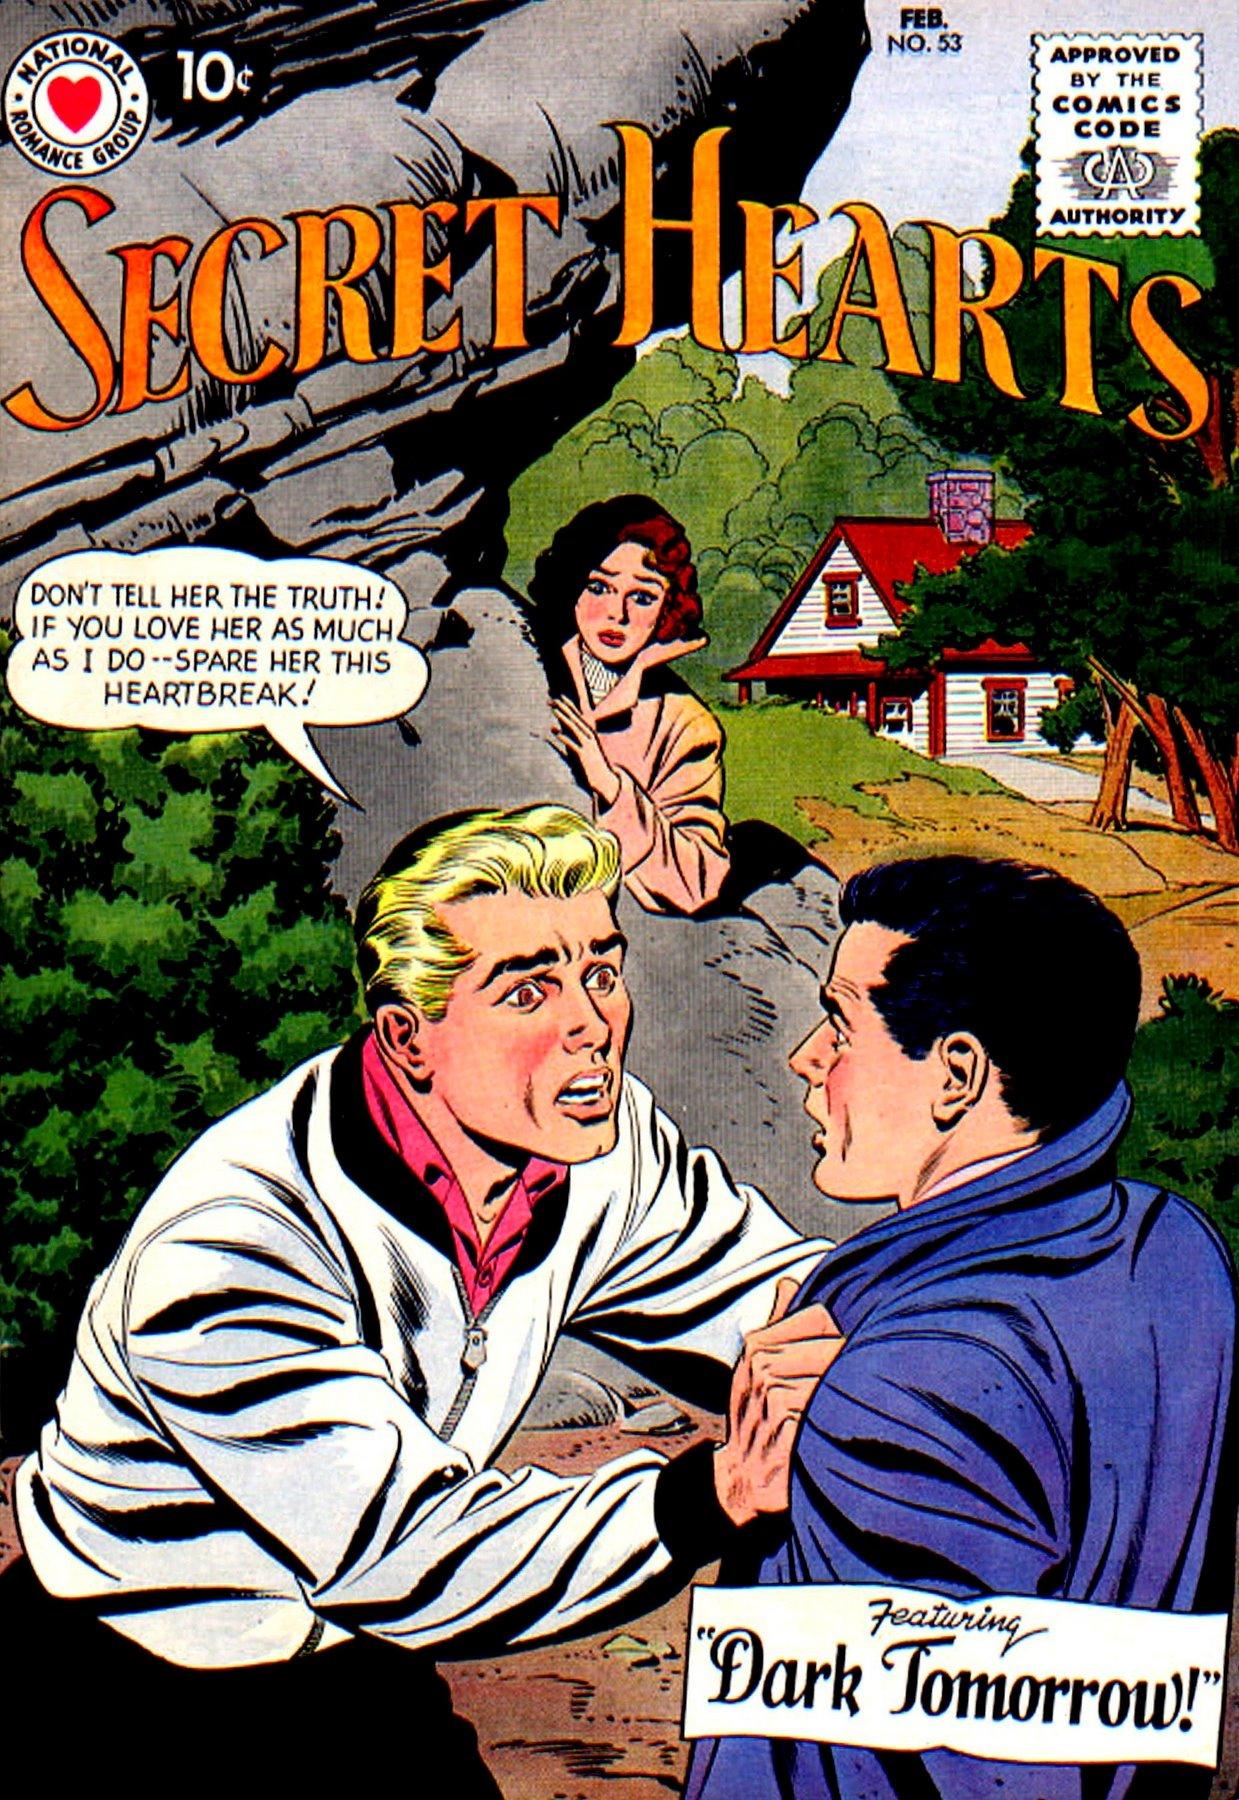 Read online Secret Hearts comic -  Issue #53 - 1